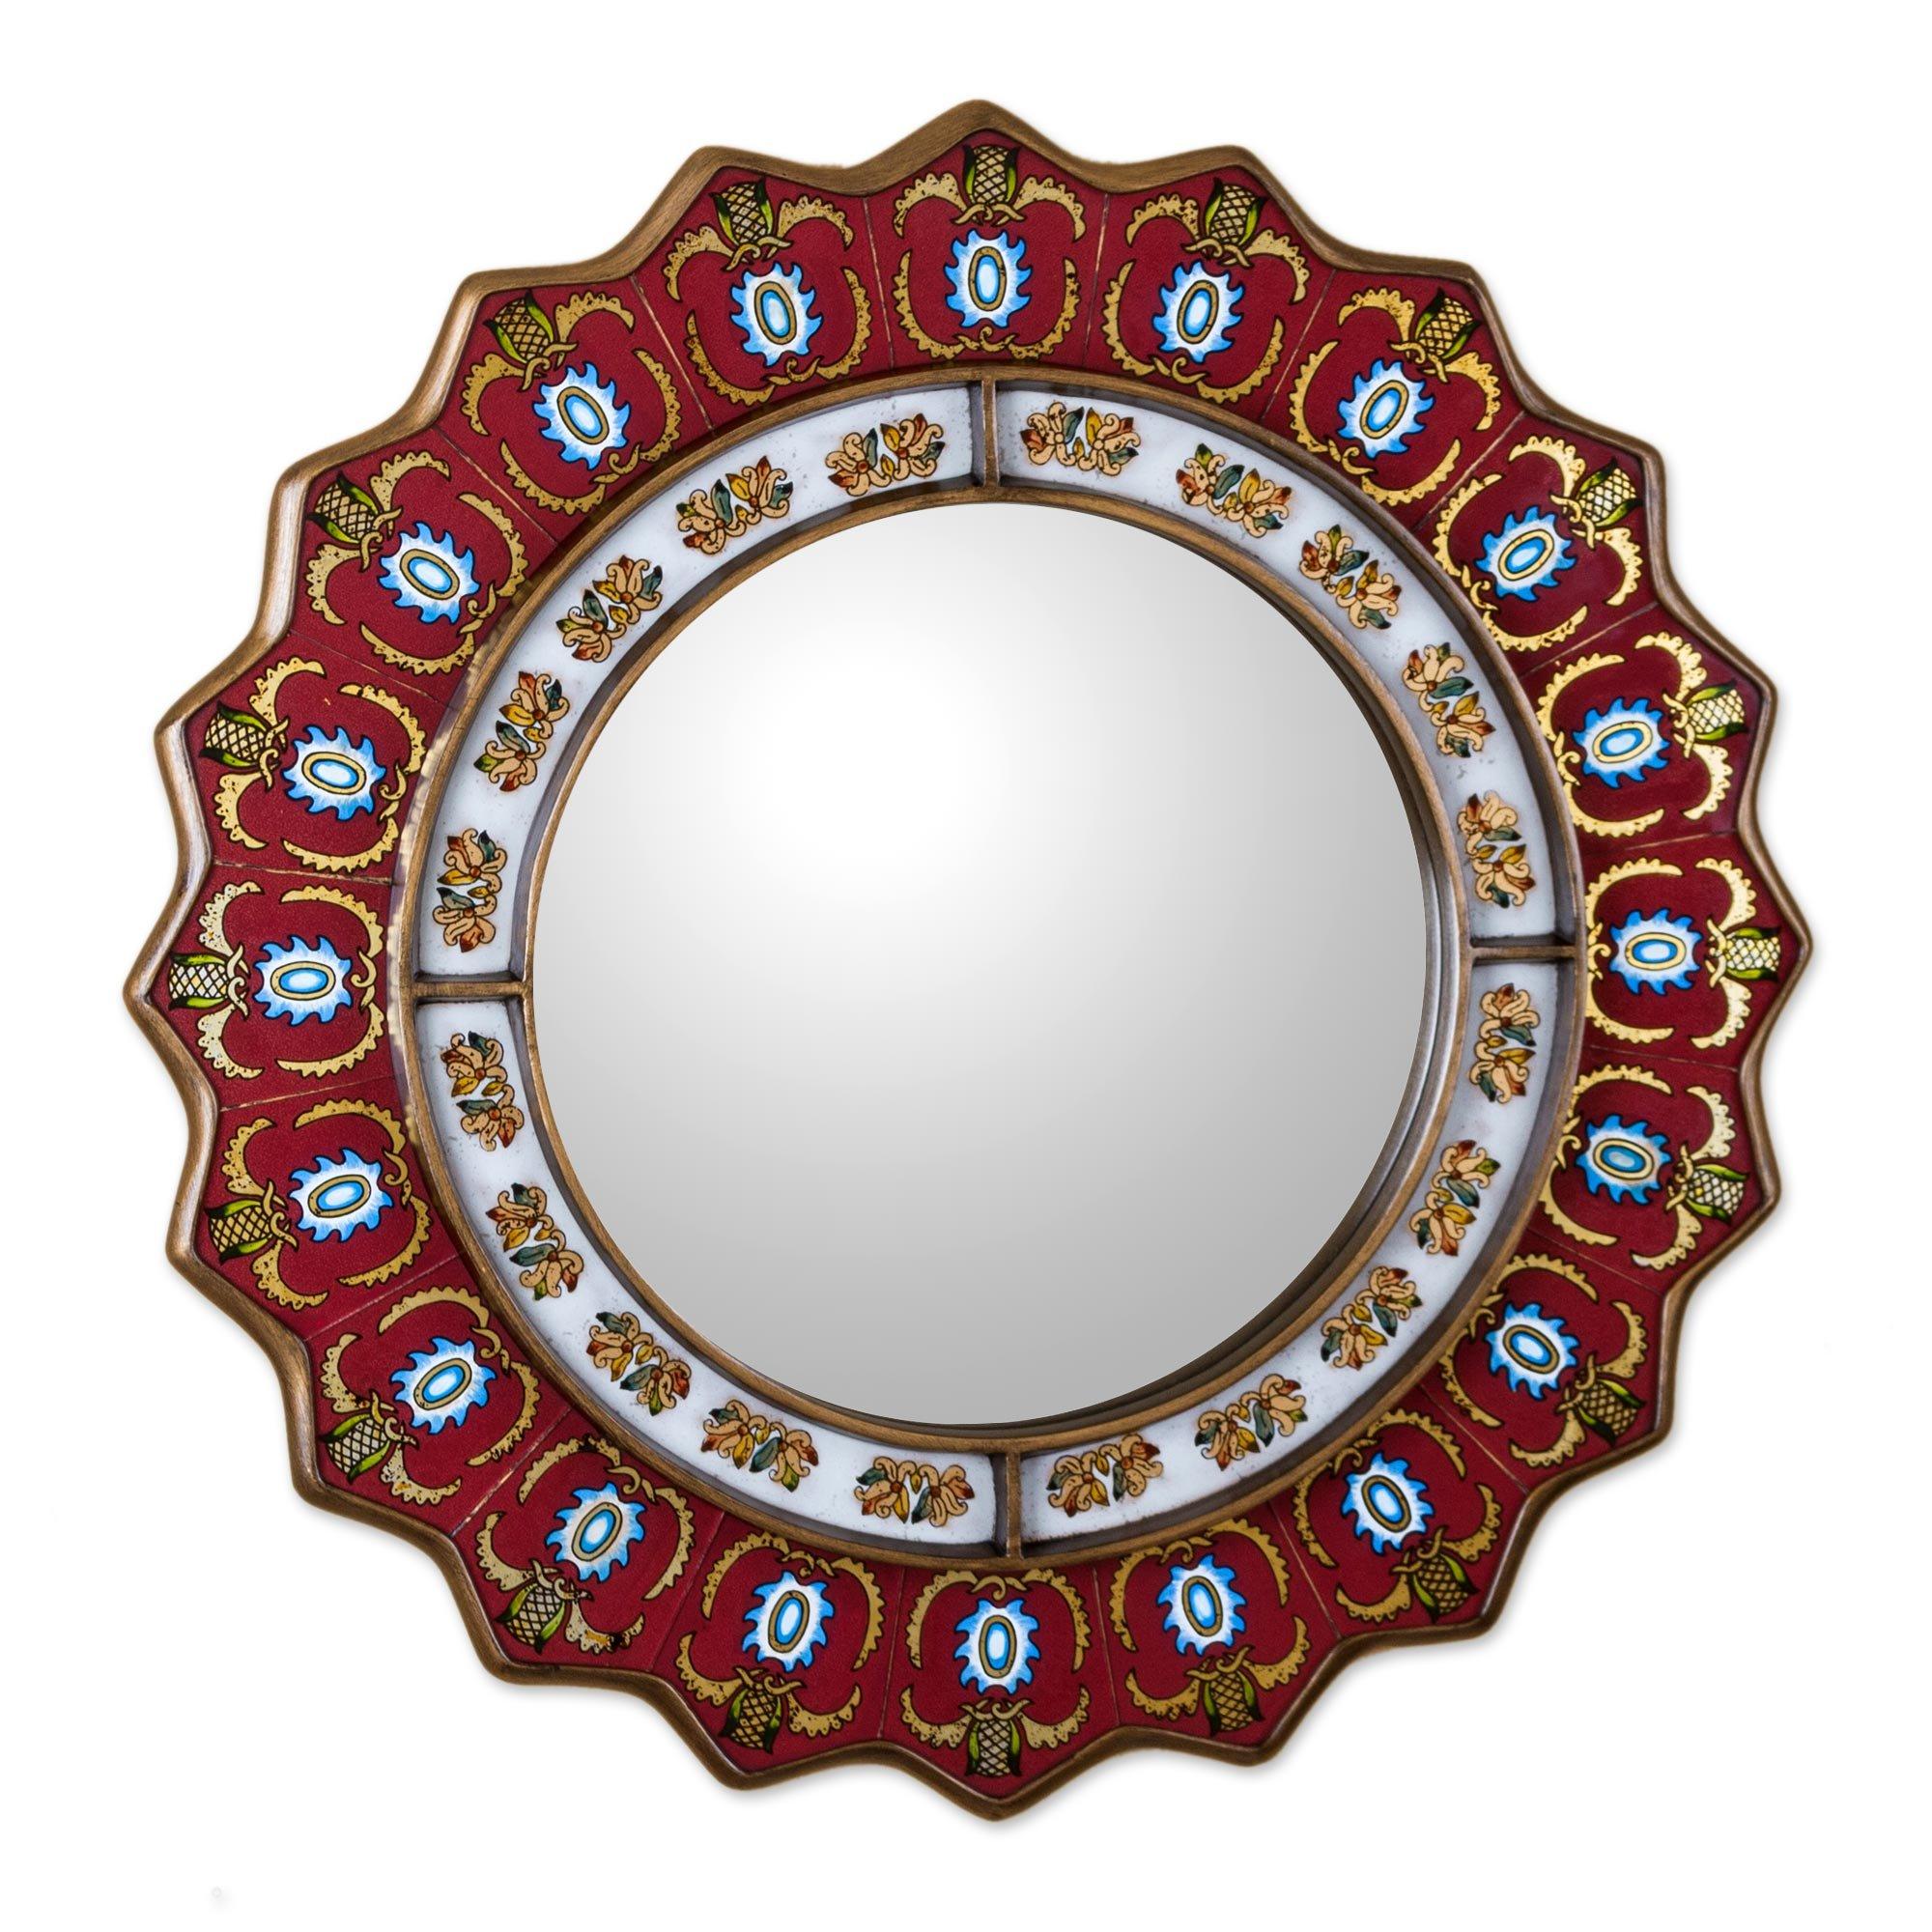 Medallion wall mirror linde citi pallet truck